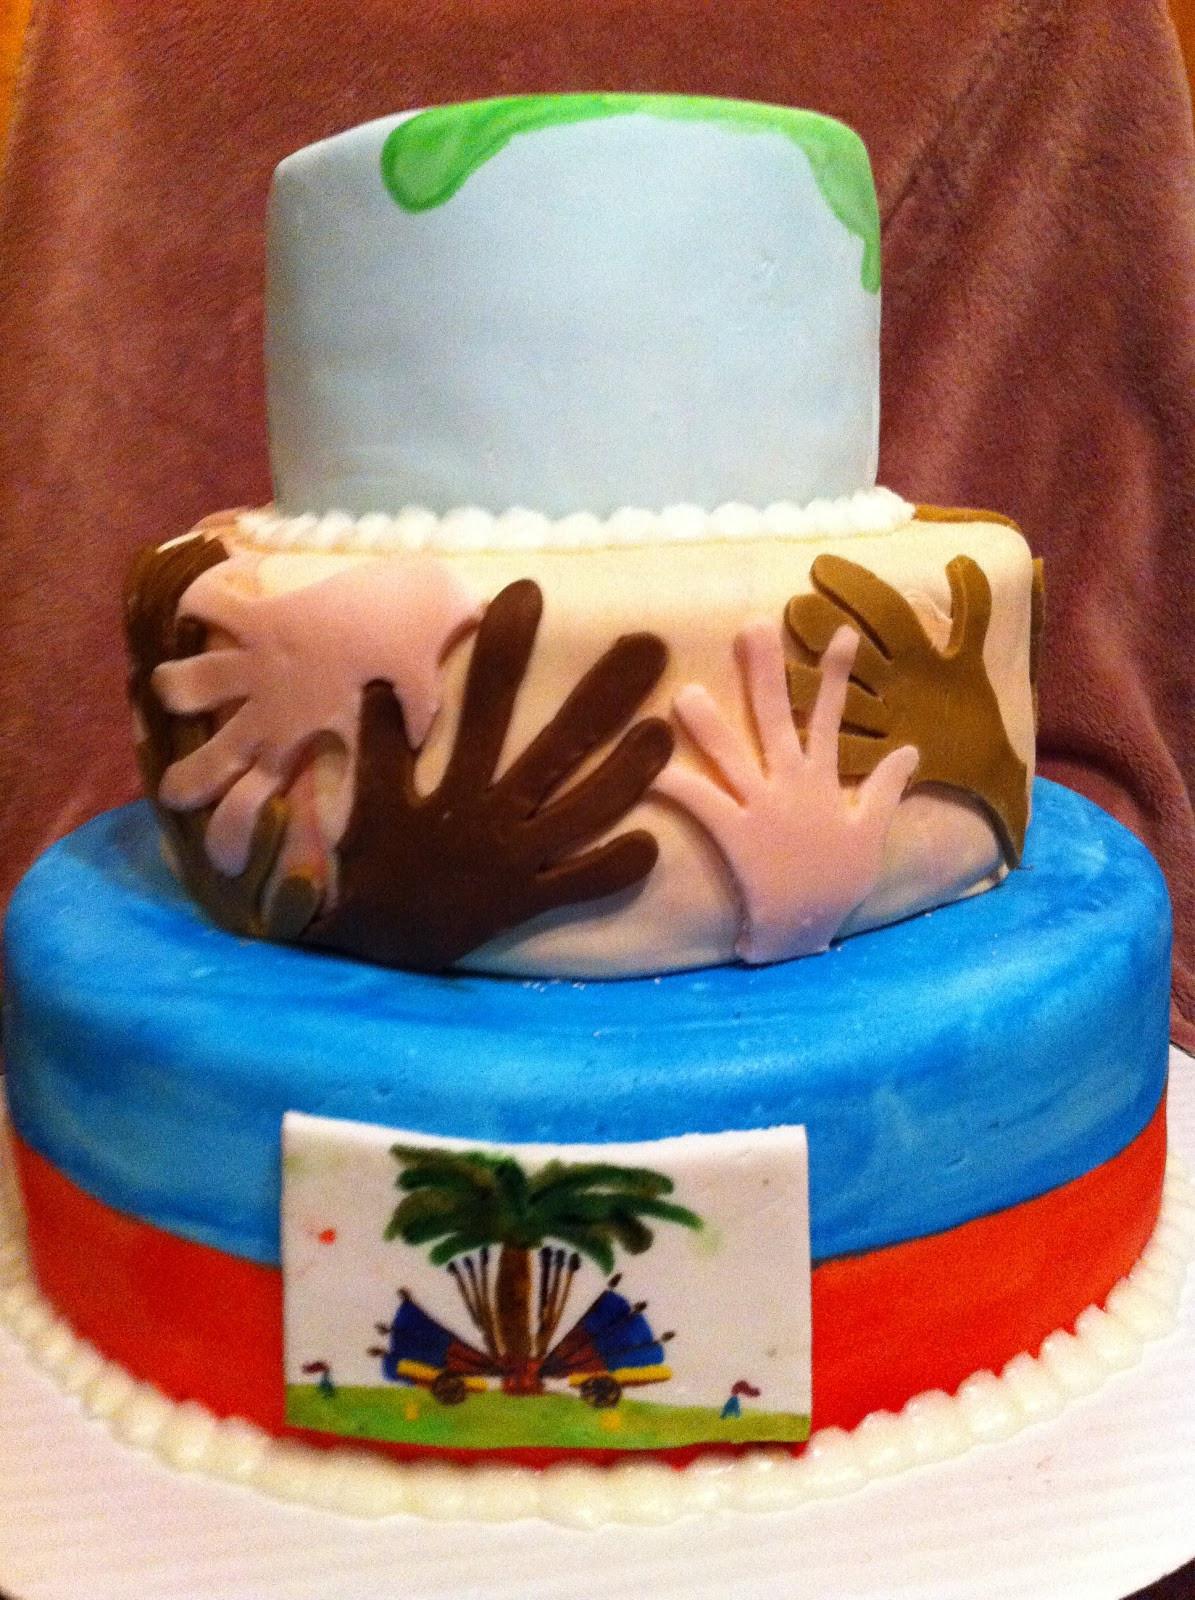 Haitian Wedding Cakes  Les Gateaux Hope for Haiti